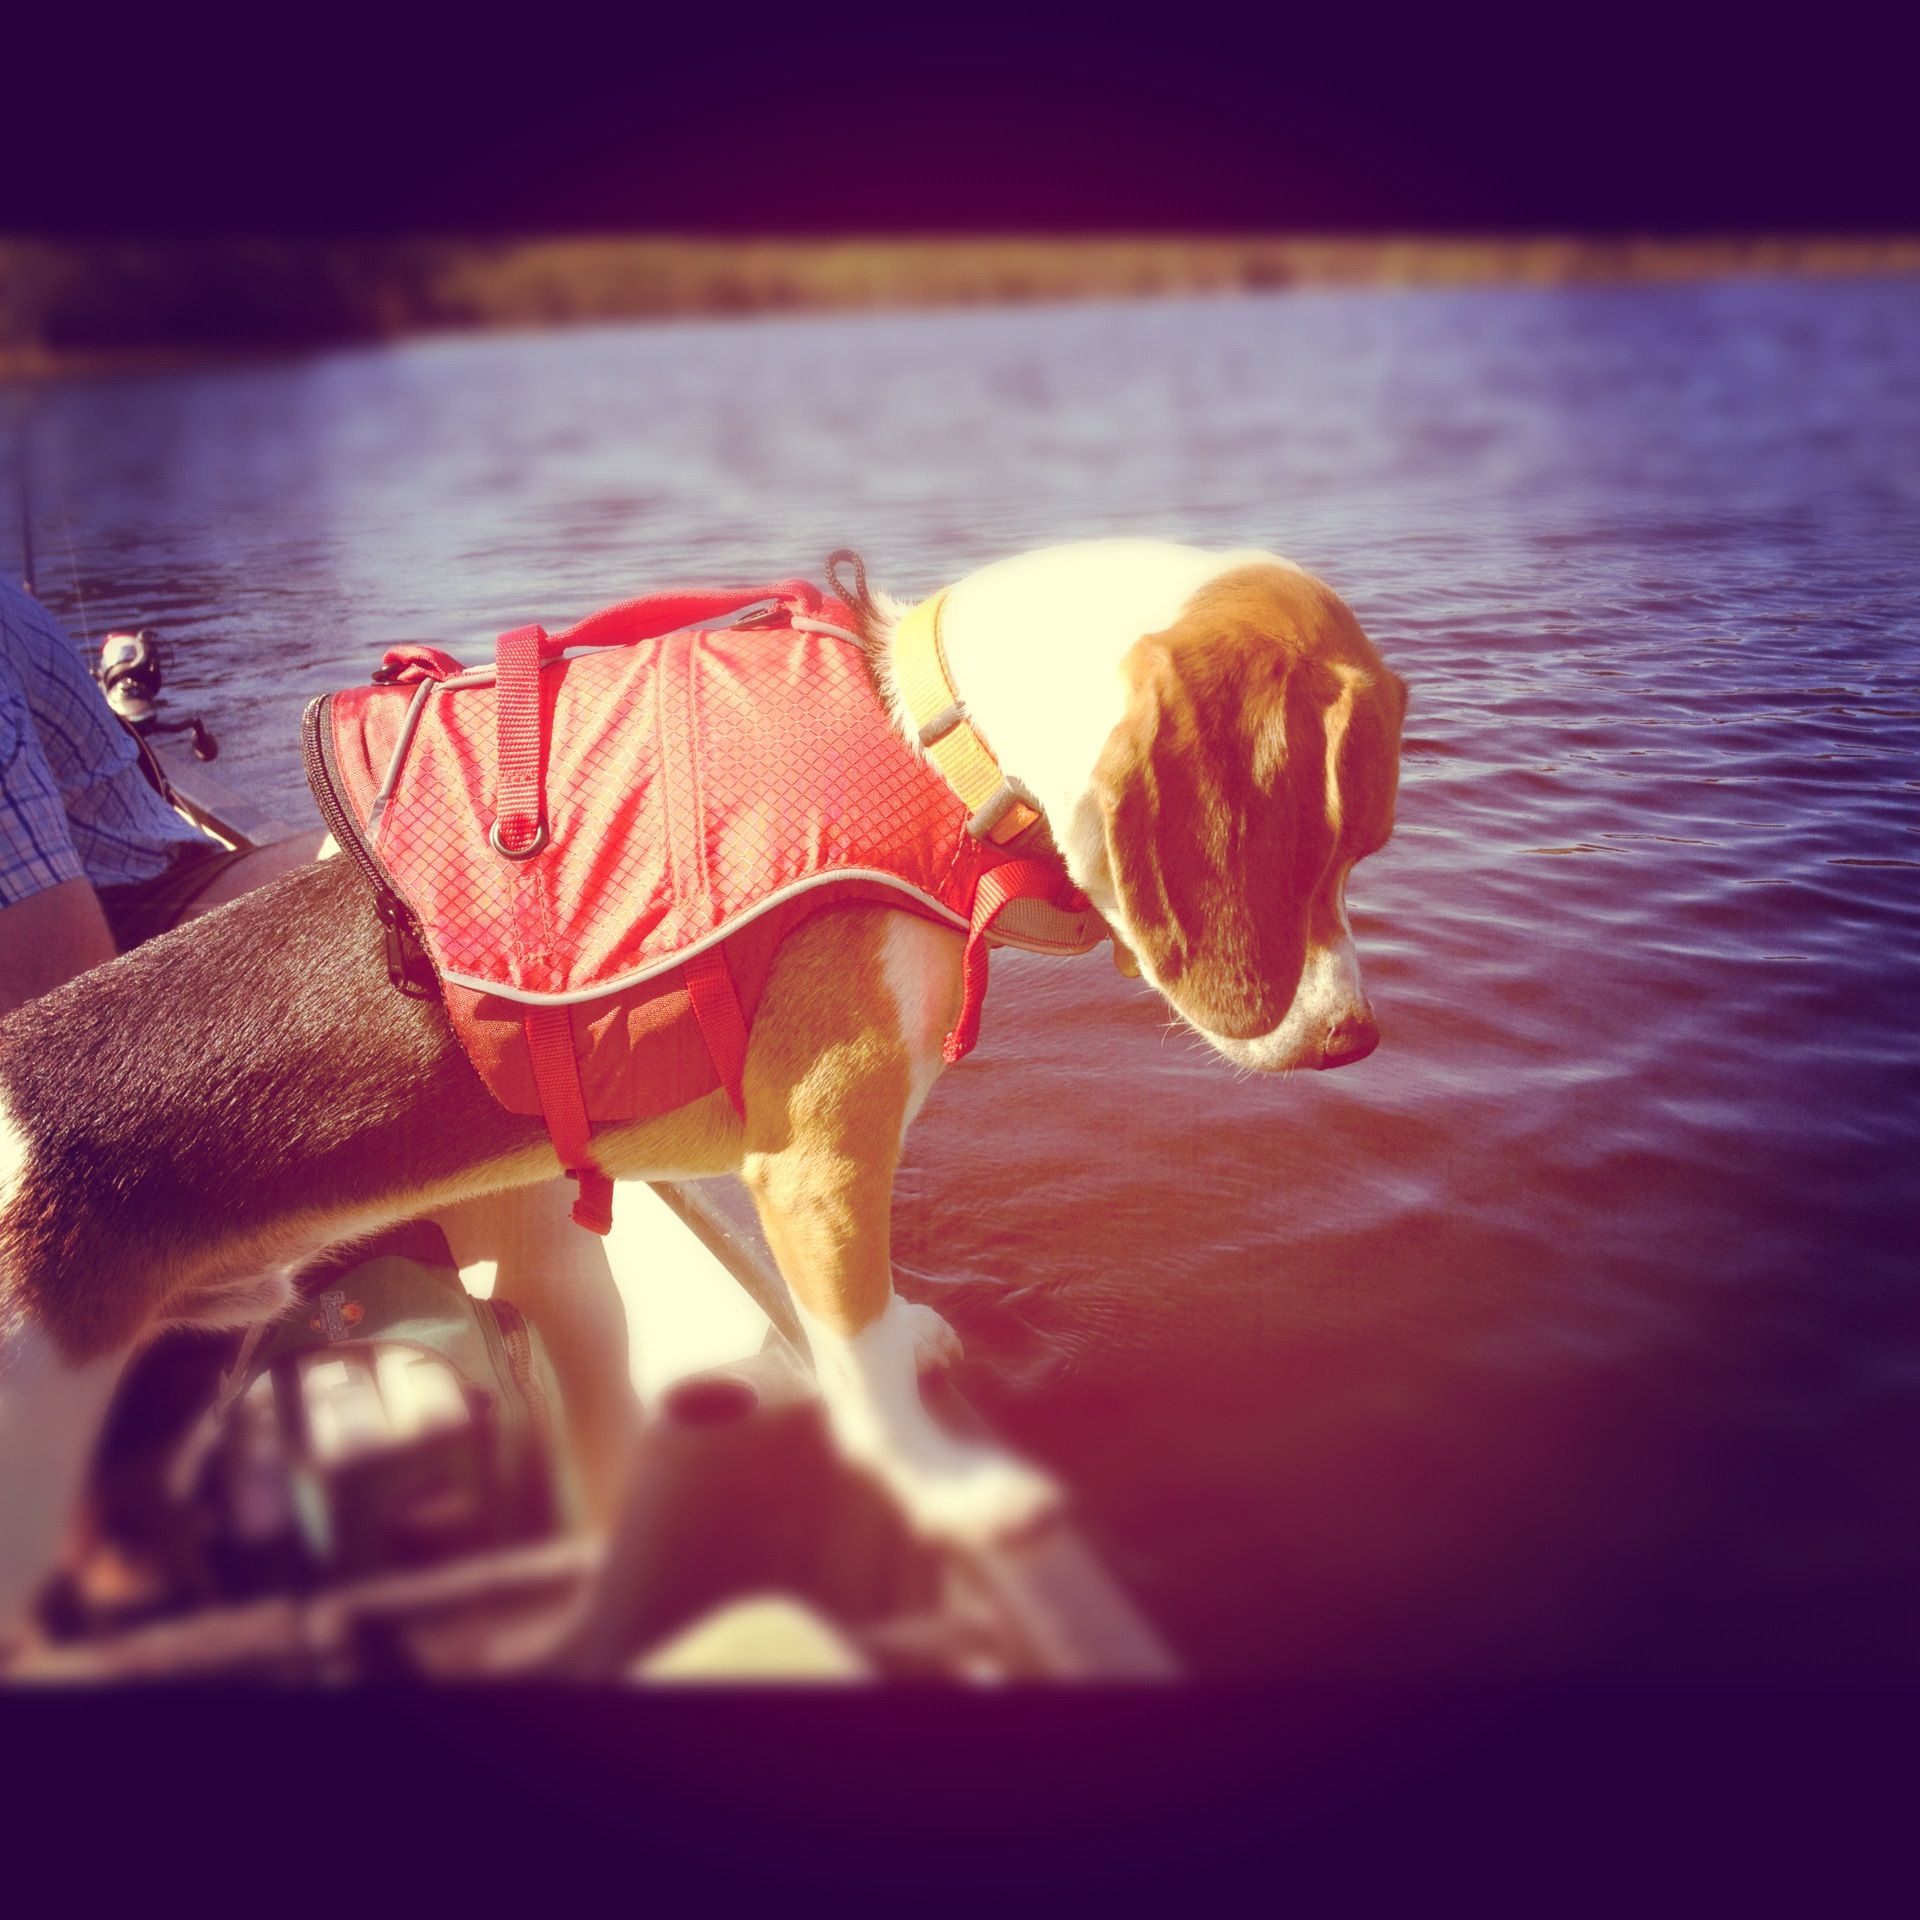 Beagle on a boat